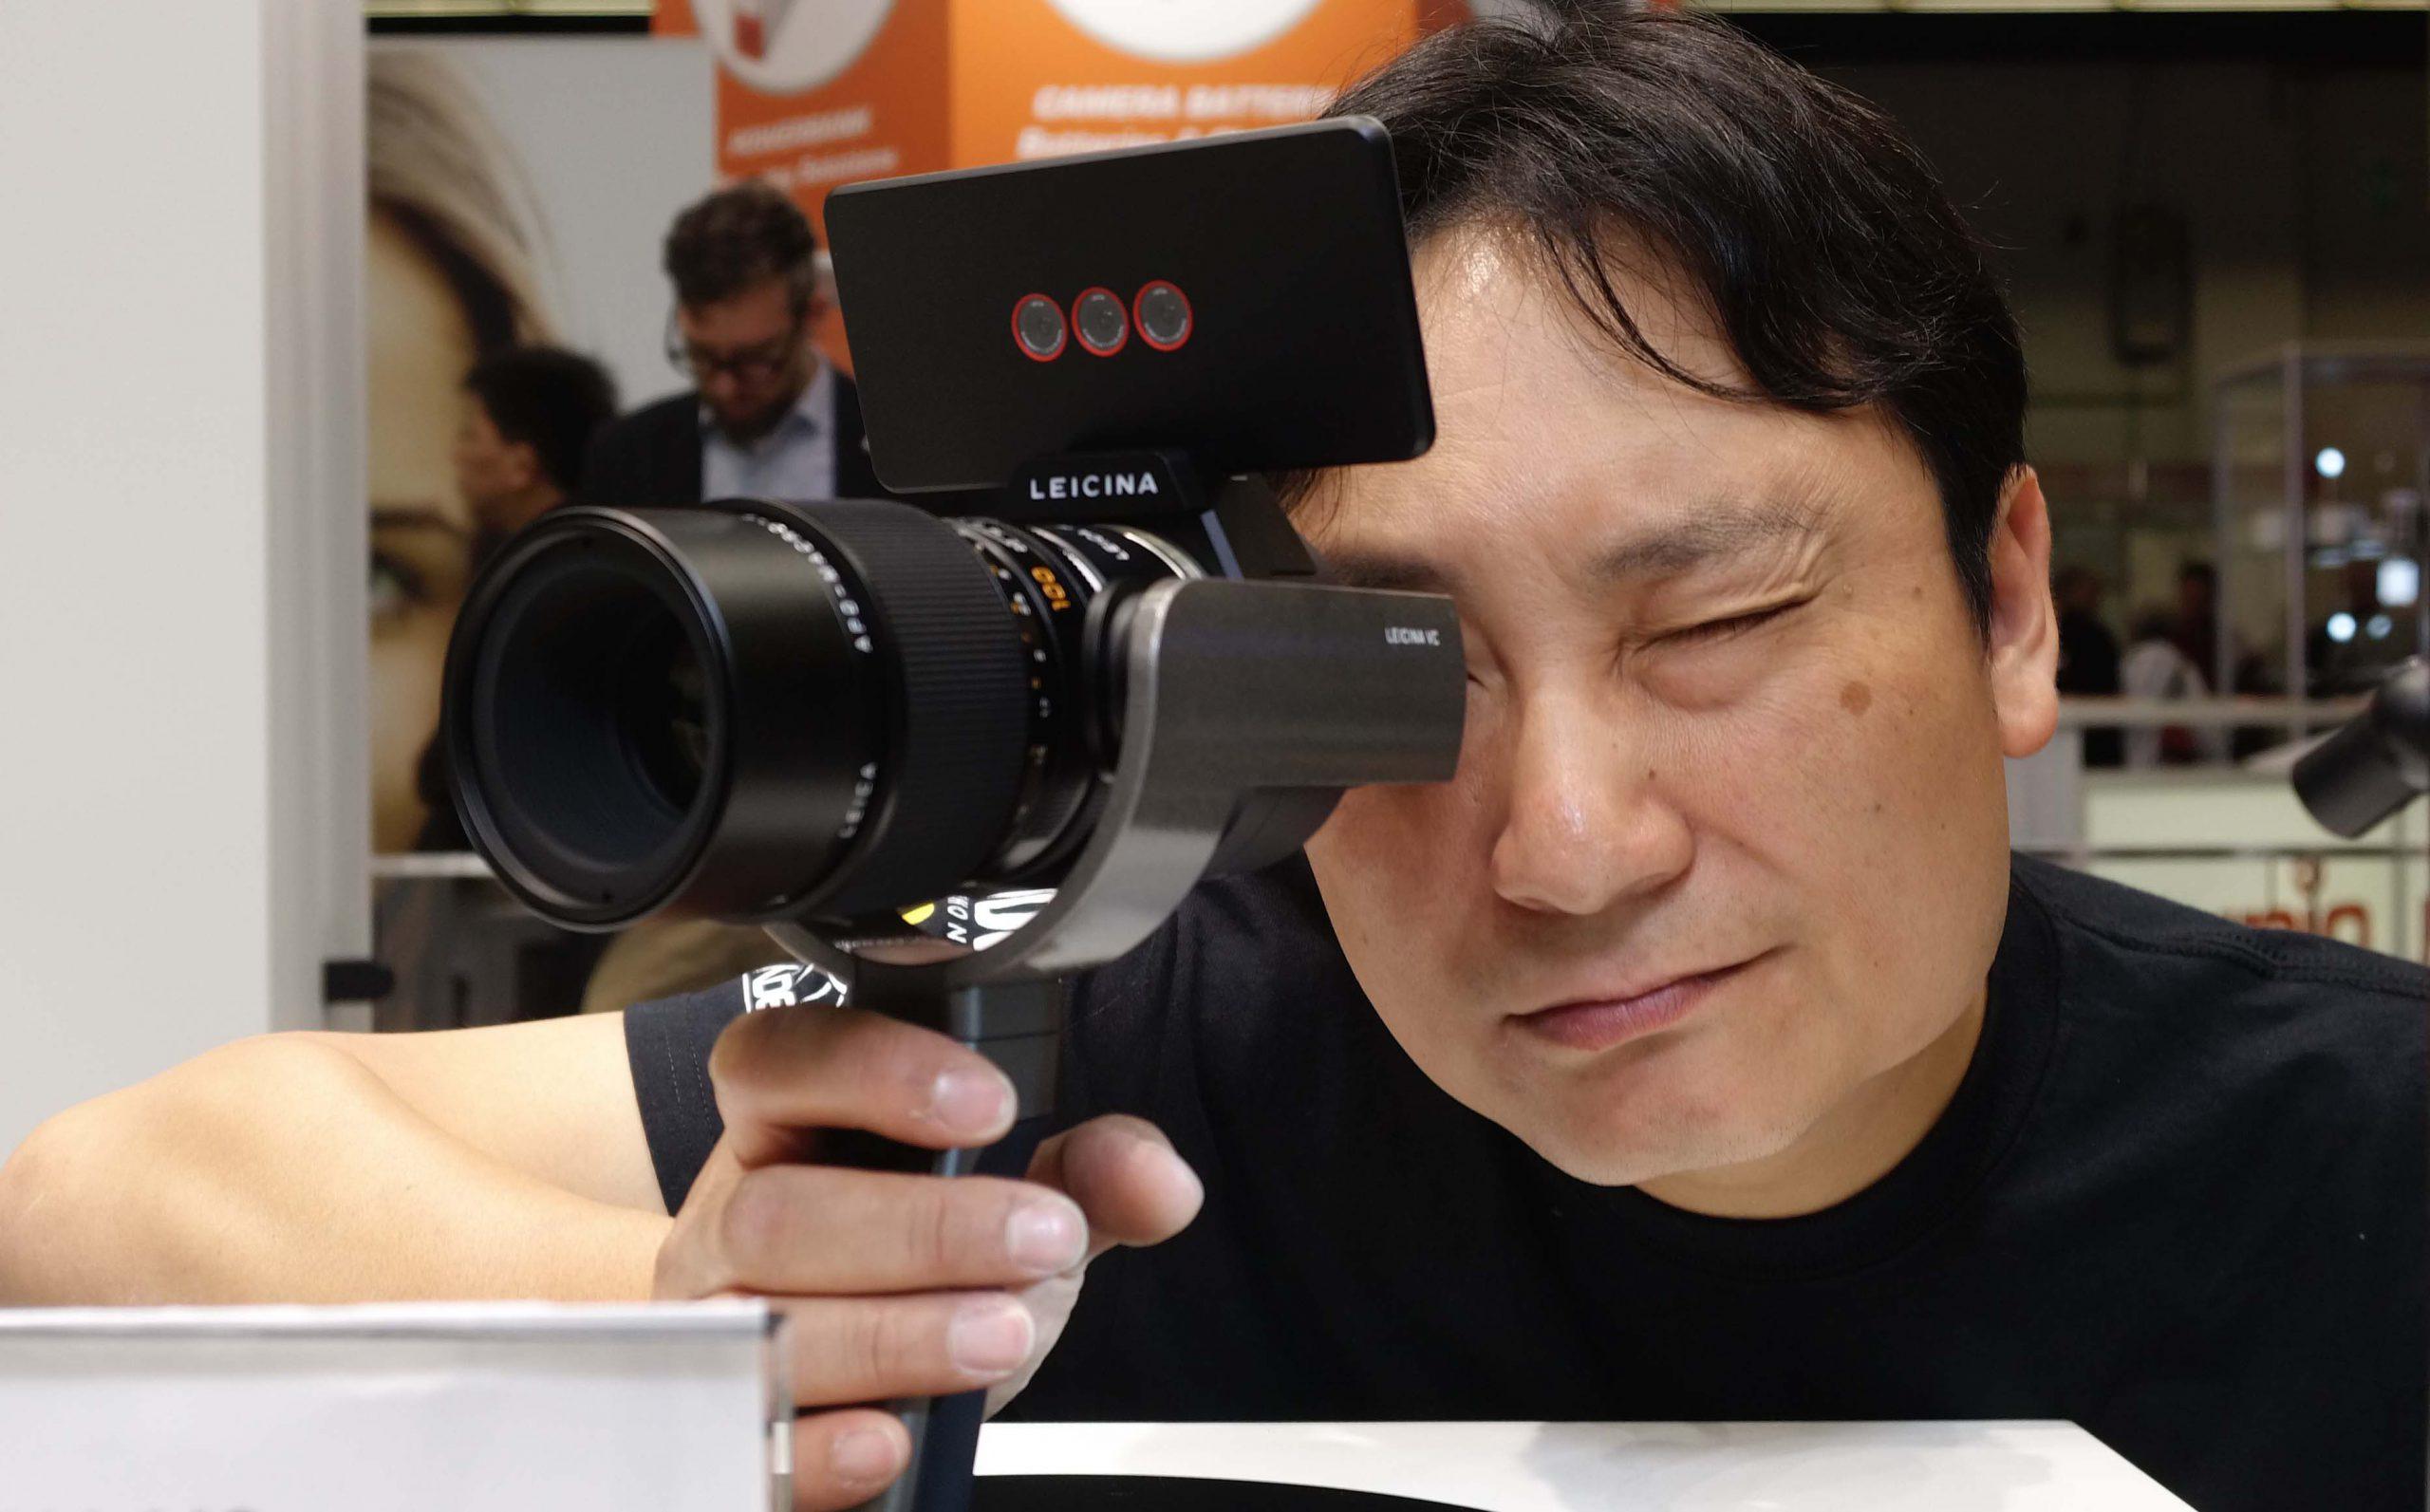 Dan Chung shoots with the Leicina prototype direct's viewfinder at Photokina 2016